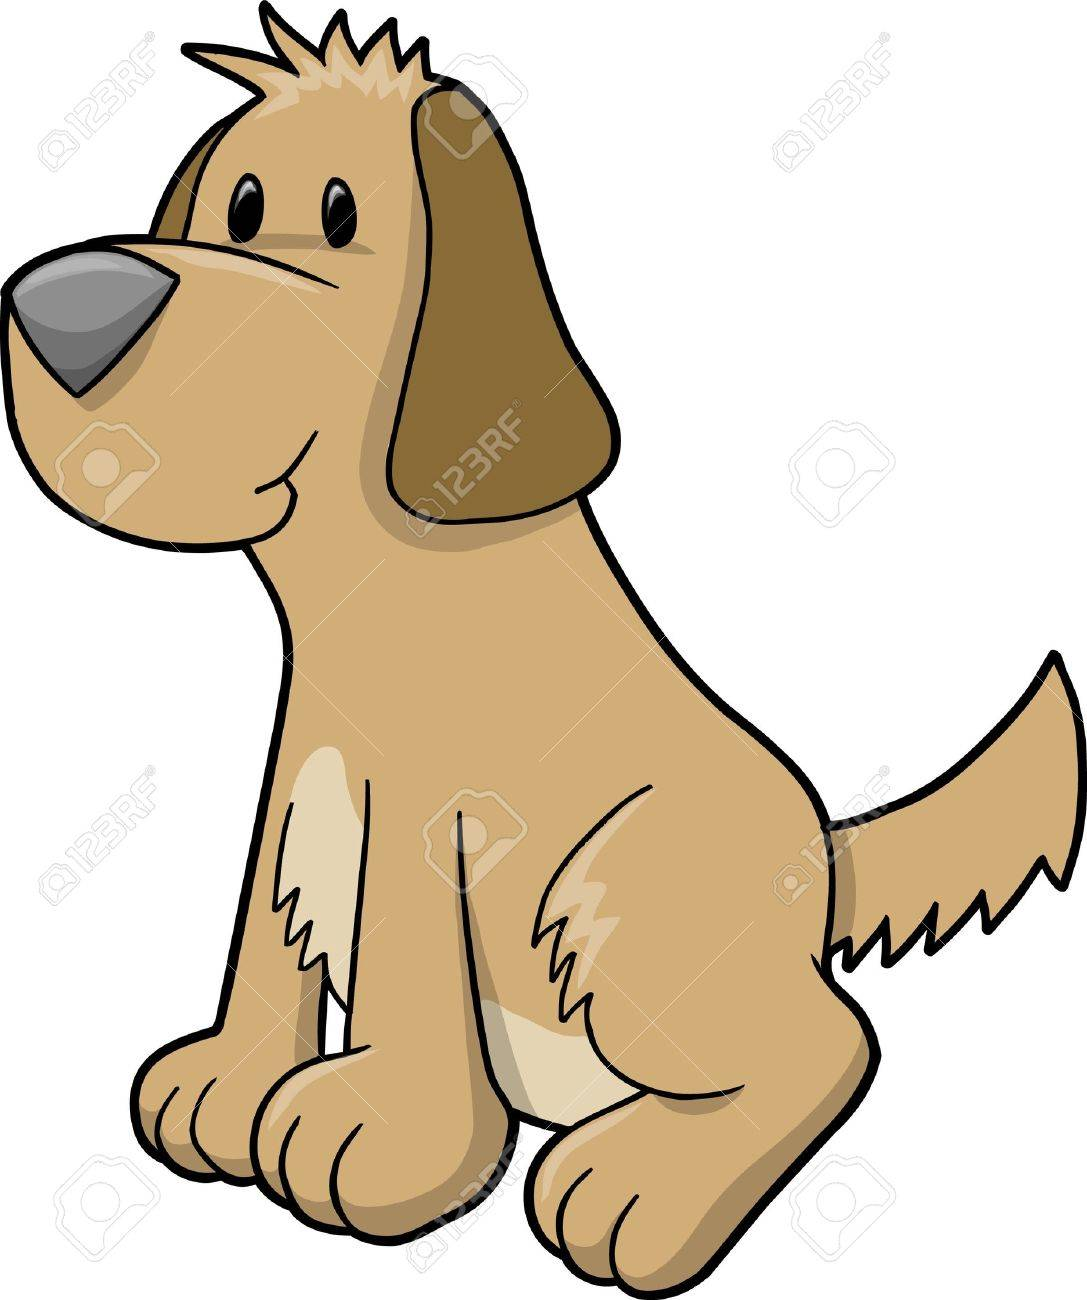 Super Cute Puppy Dog Illustration - 10031042